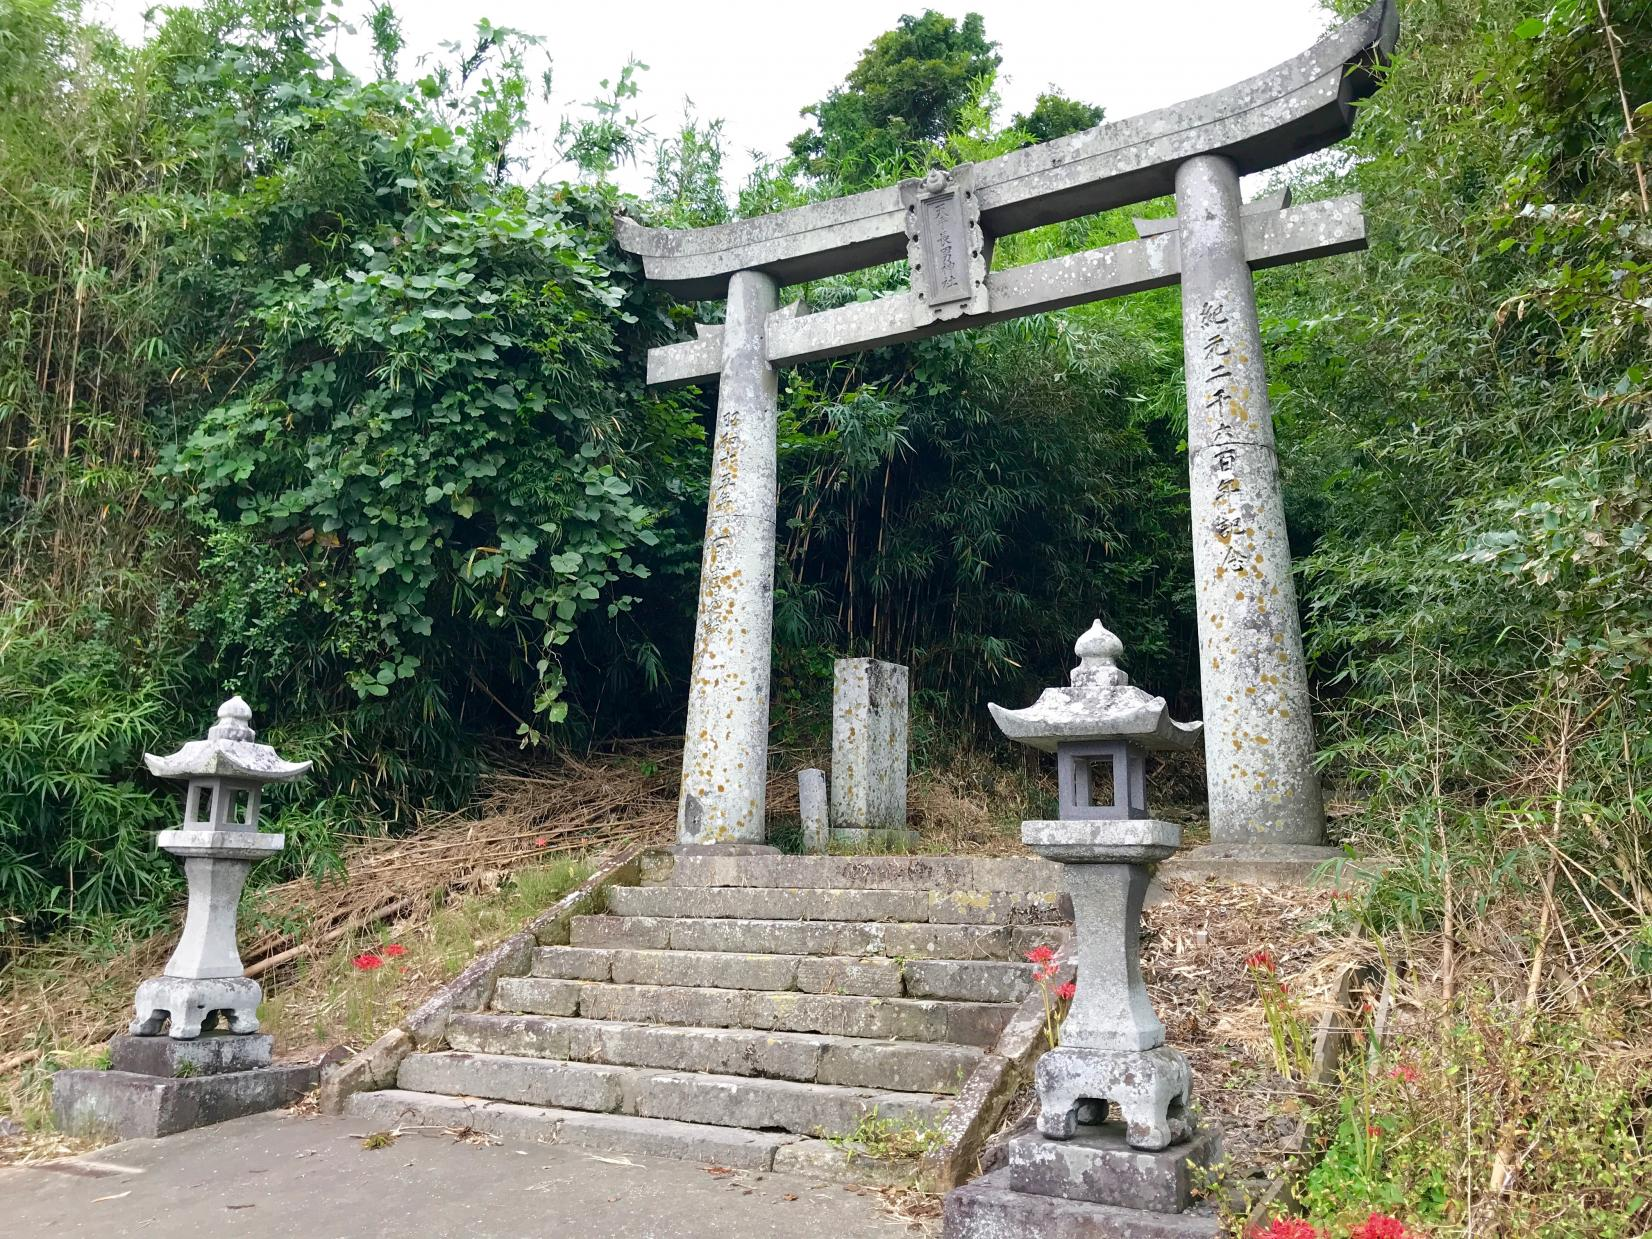 Amanotanagao Shrine: The Shrine with the Highest Status on Iki Shrine-0